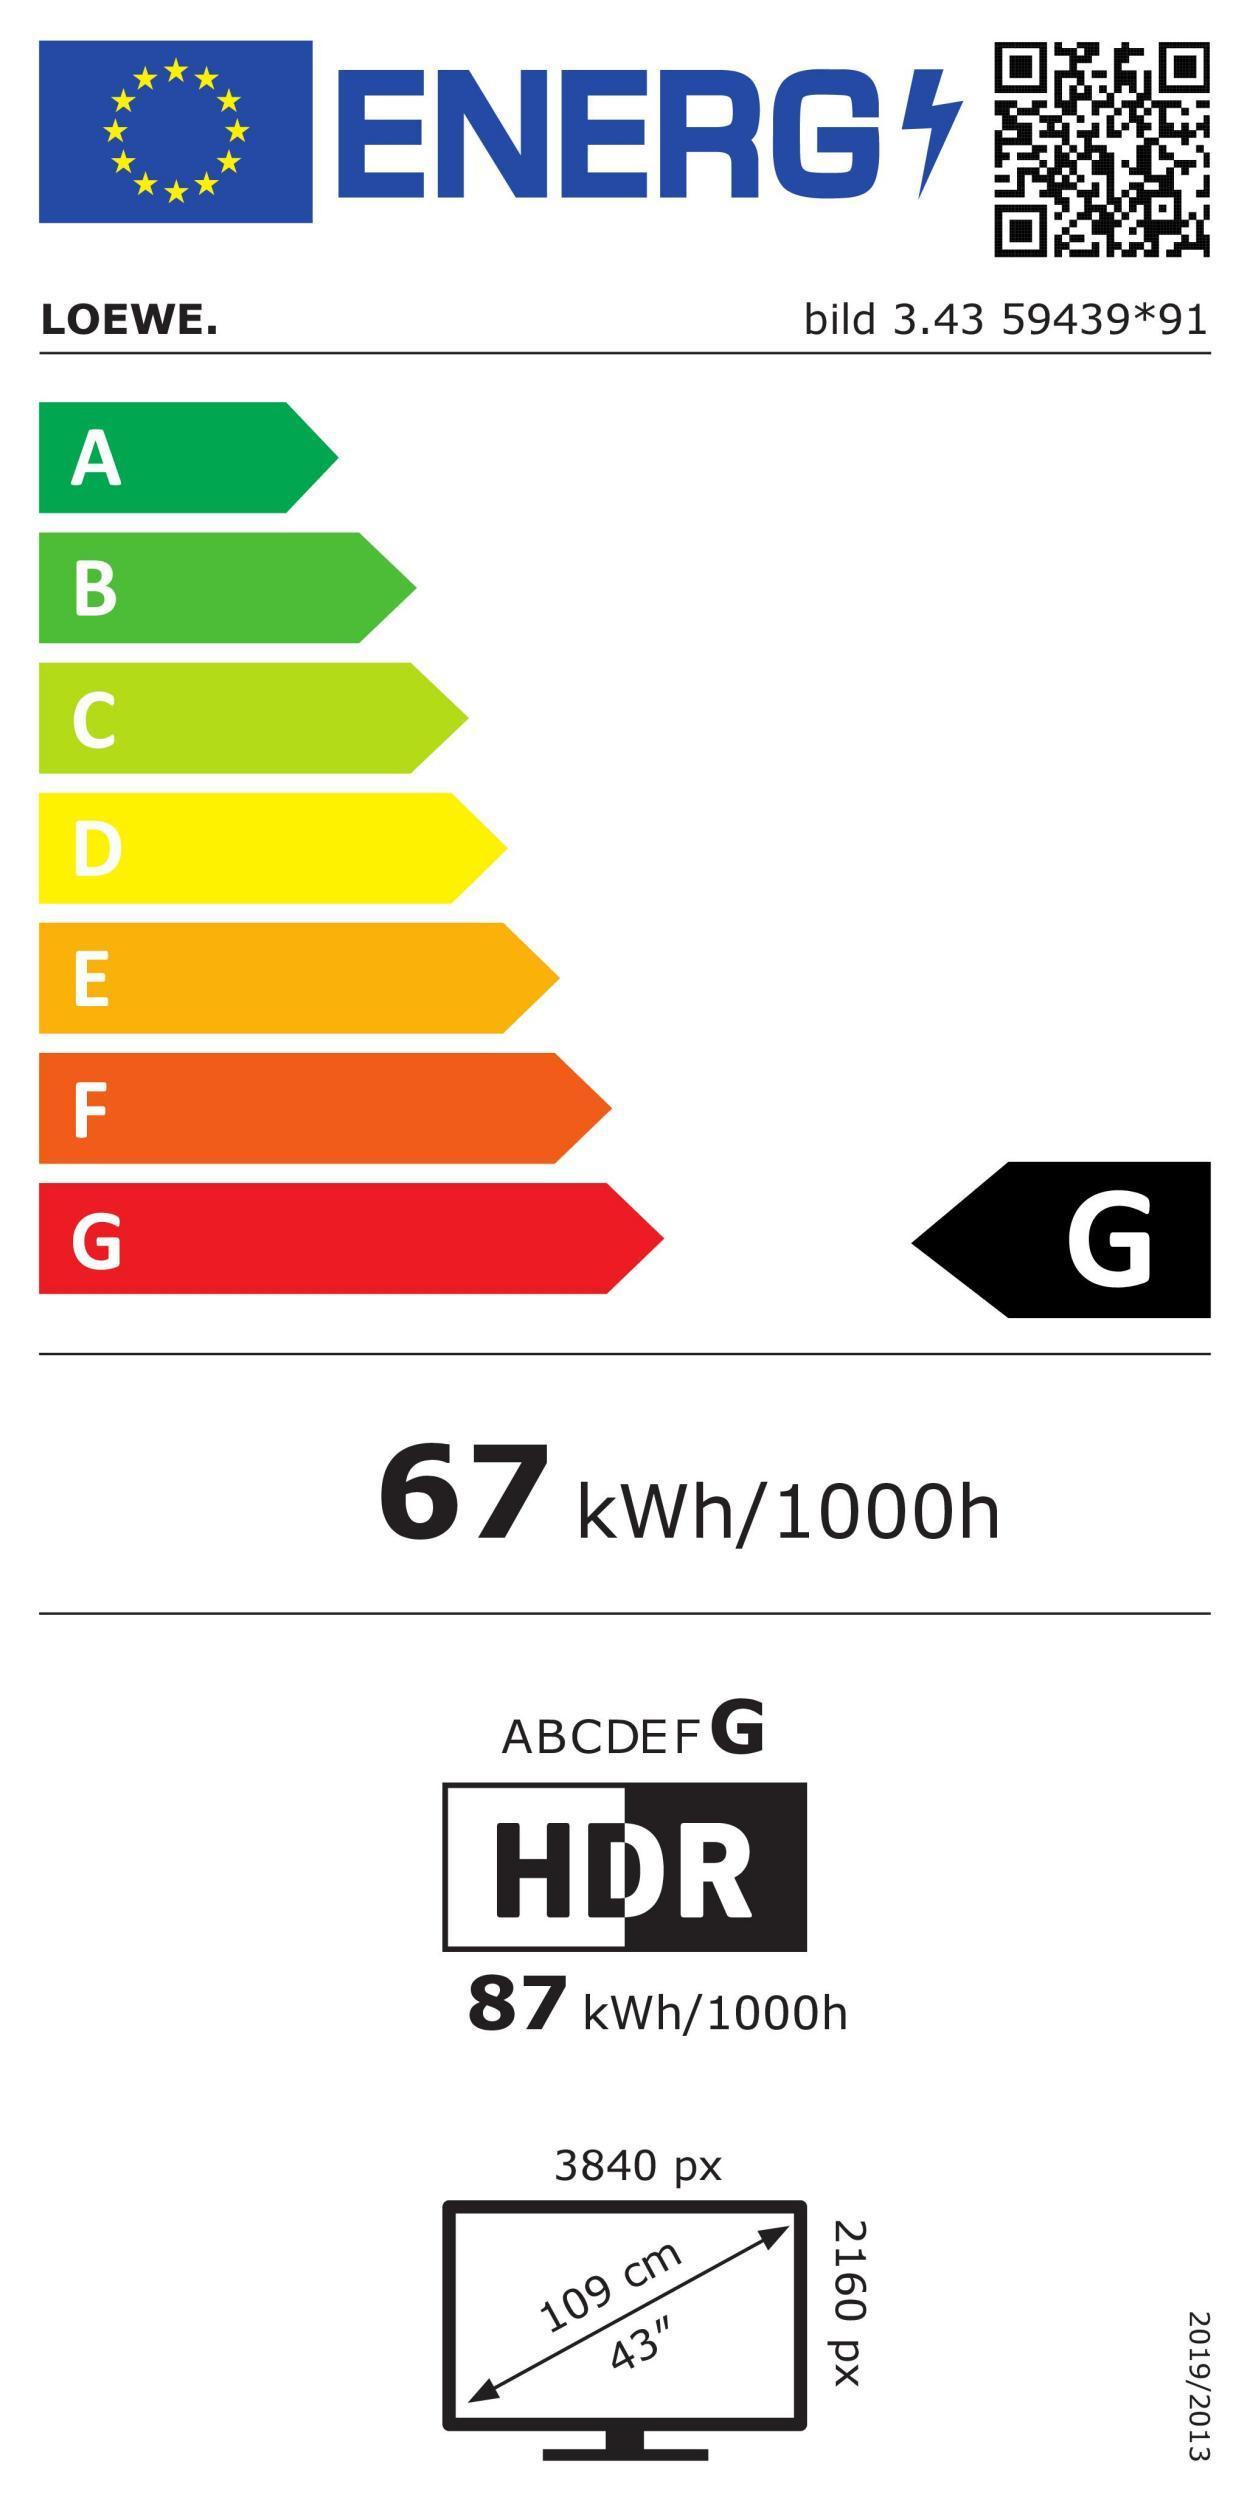 Loewe bild 3.43 basalt grey LED-TV